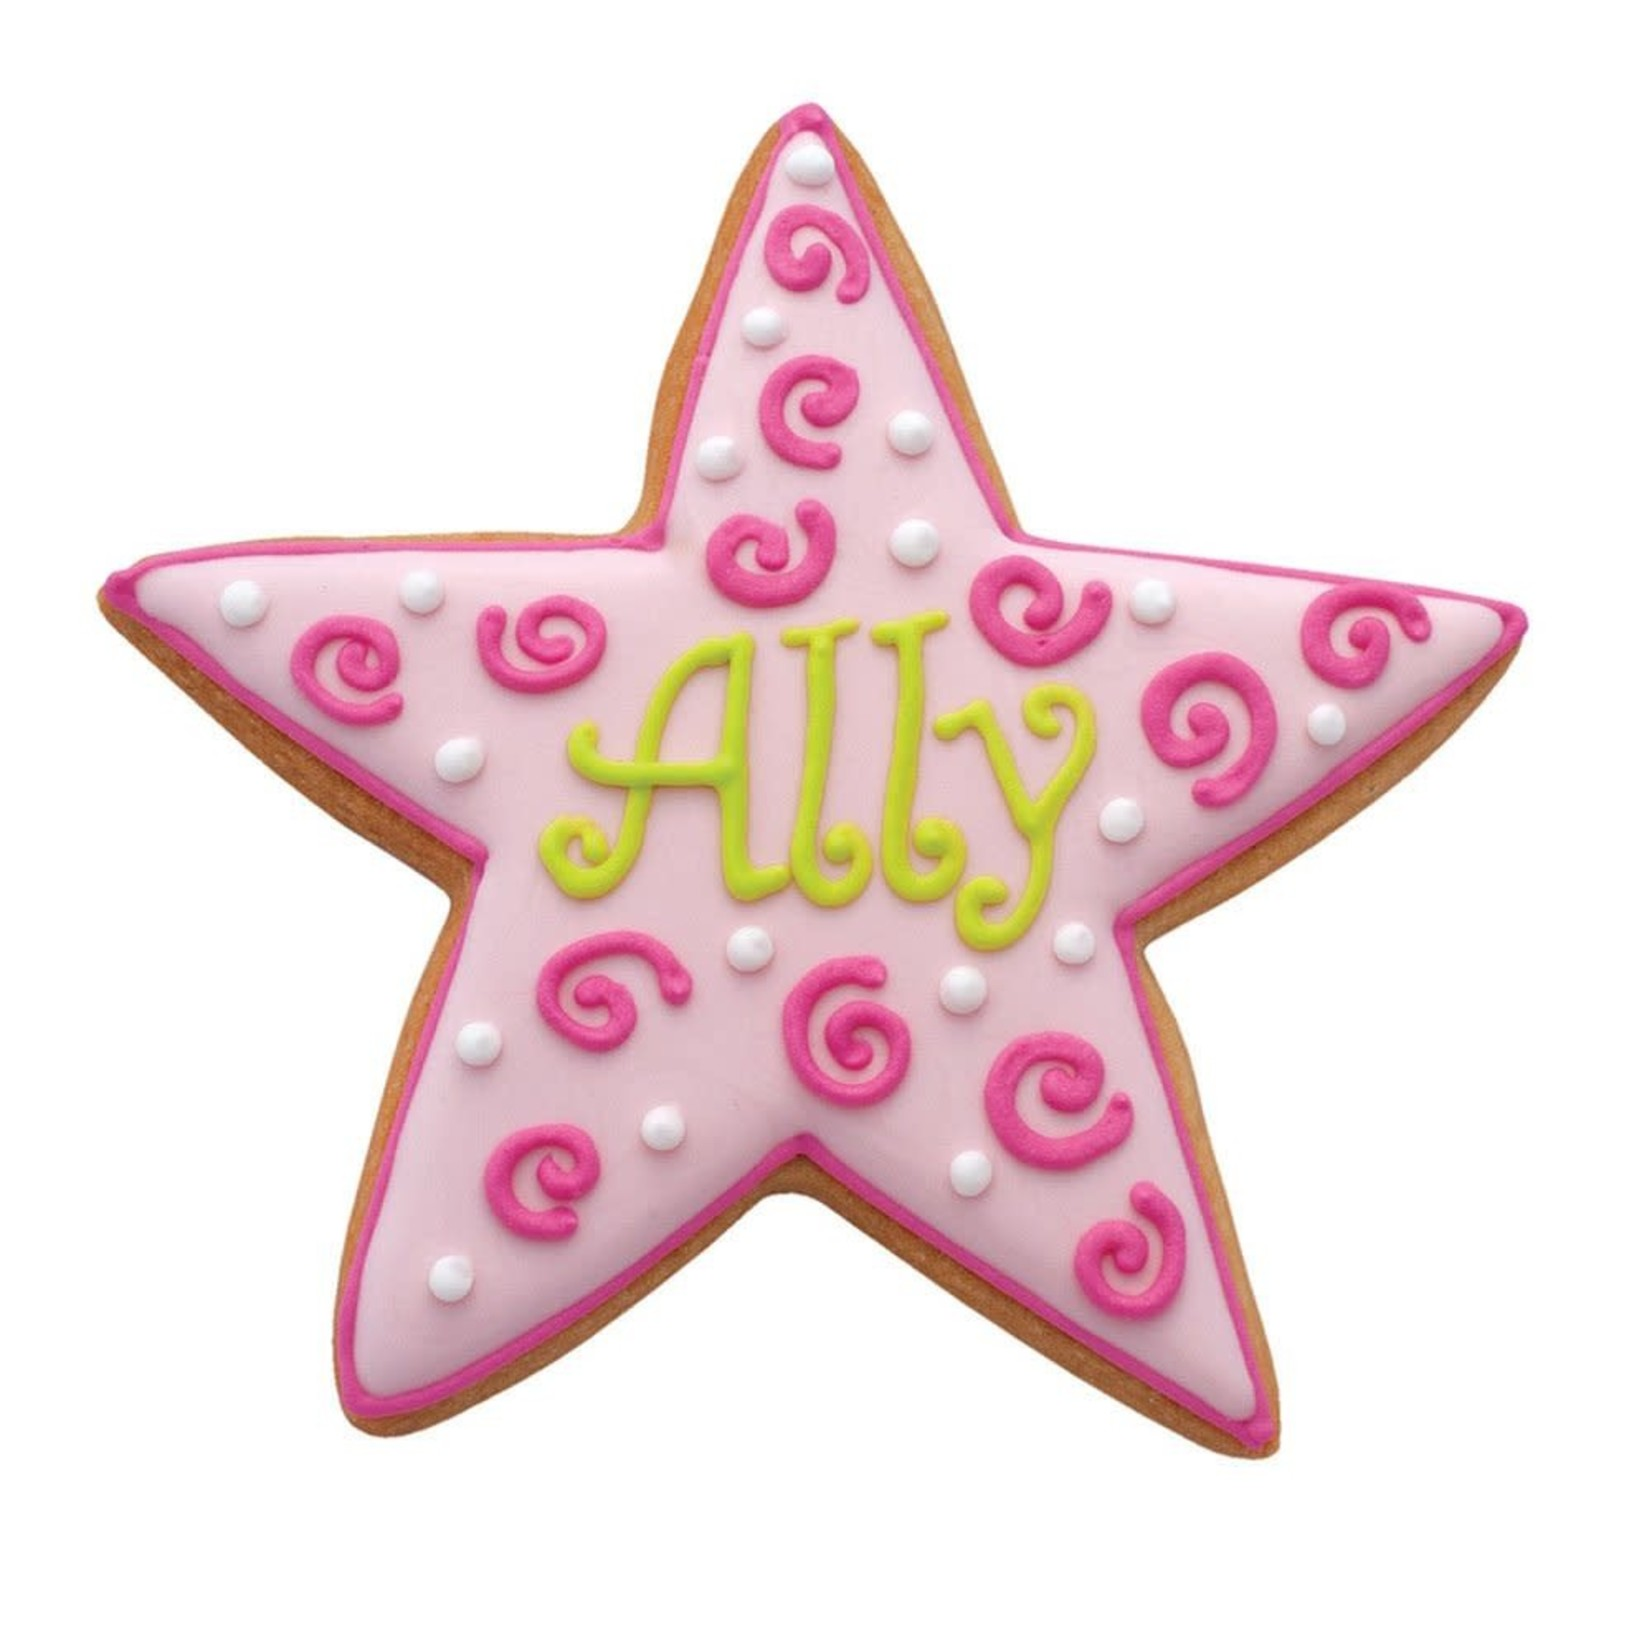 "3.25"" Star Cookie Cutter"